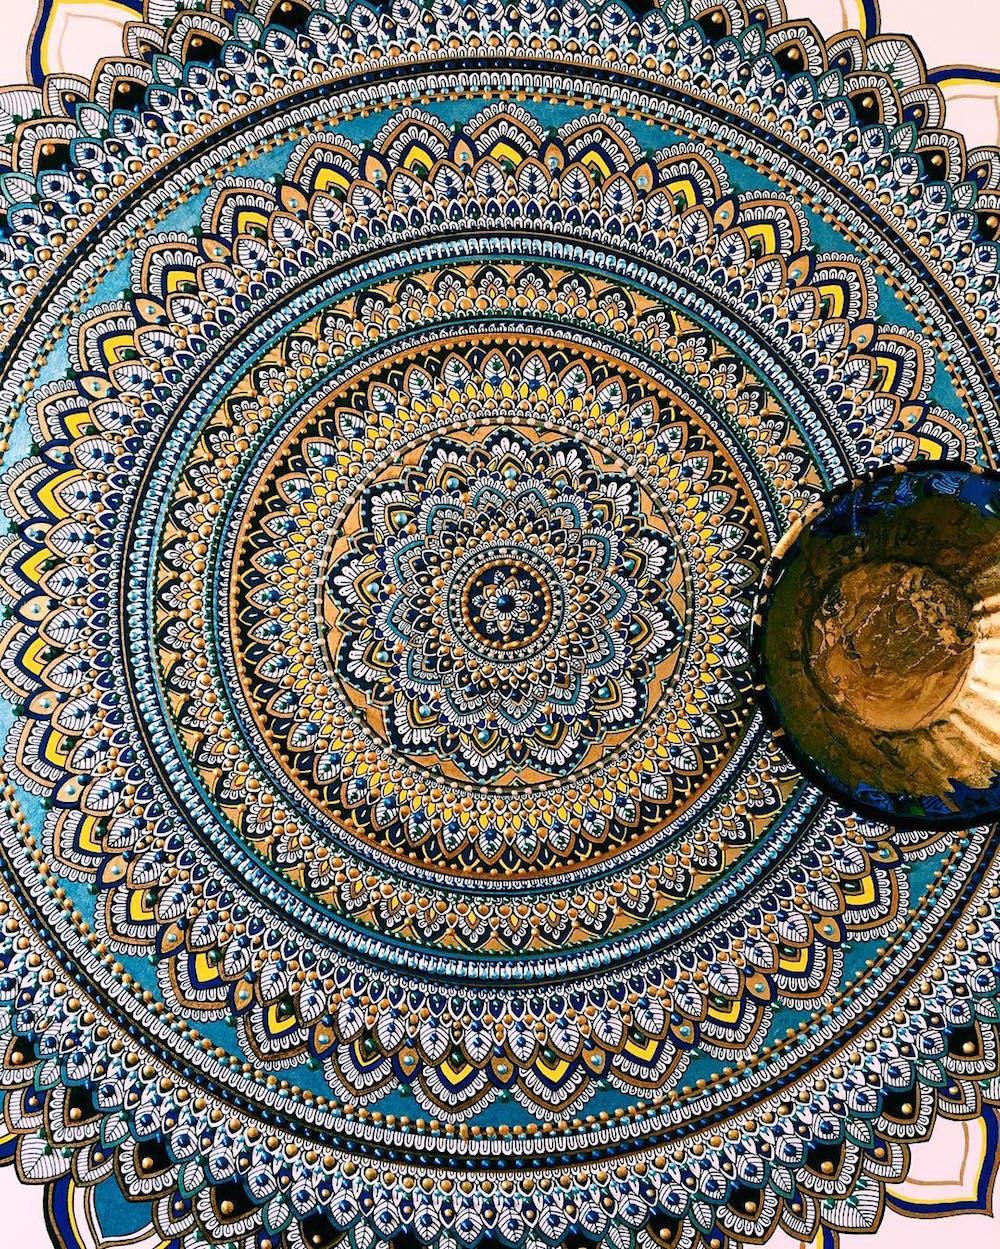 this artist brings hypercomplex mandalas to life that